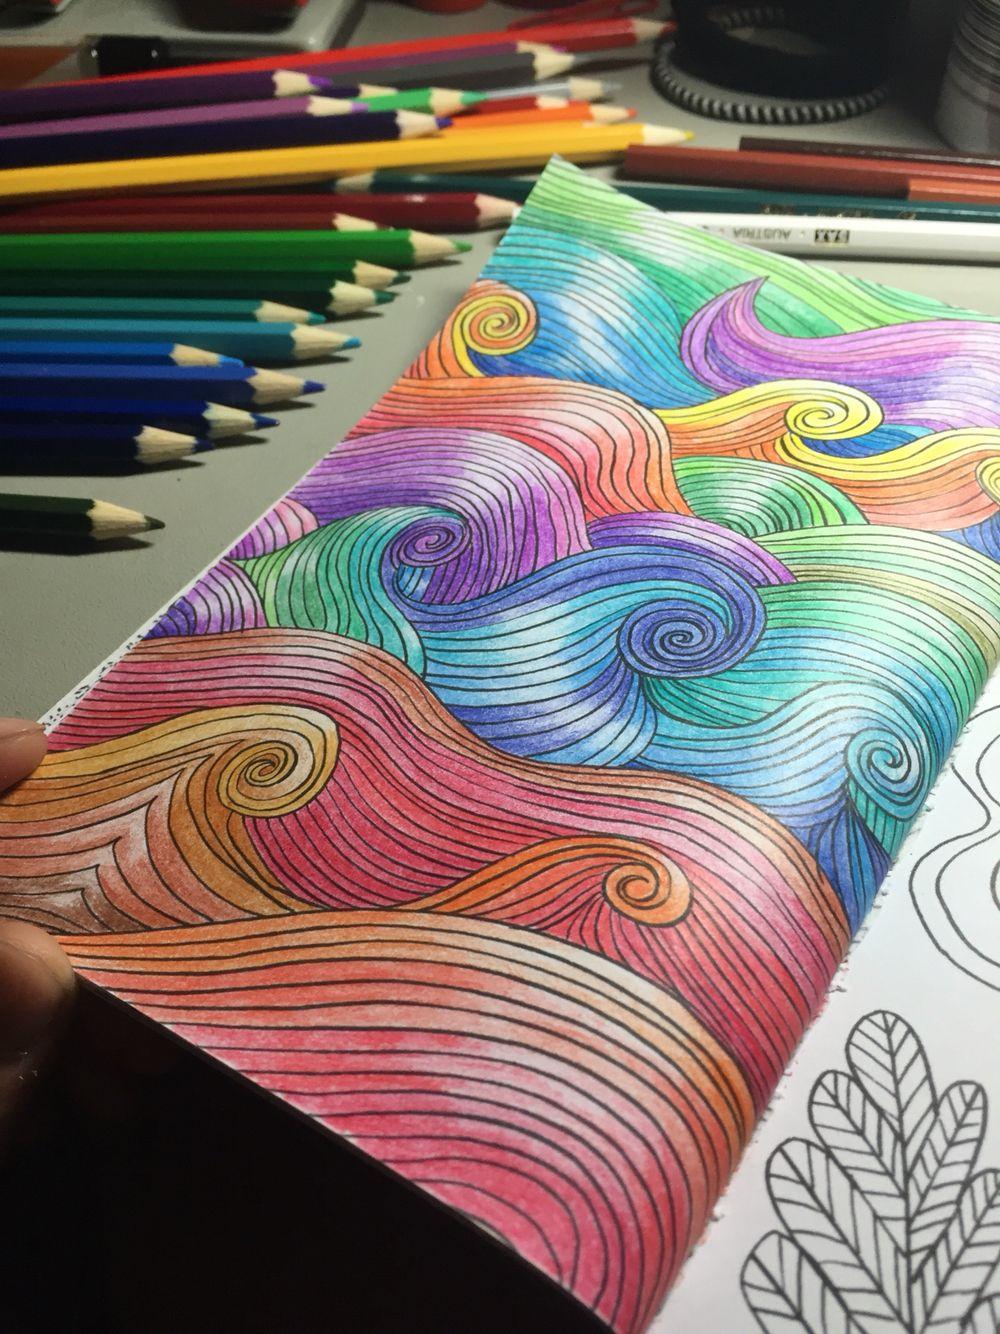 A Page From A Mindfulness Coloring Book By Emma Farrarons Color By Bc Livro De Colorir Cores Lapis De Cor